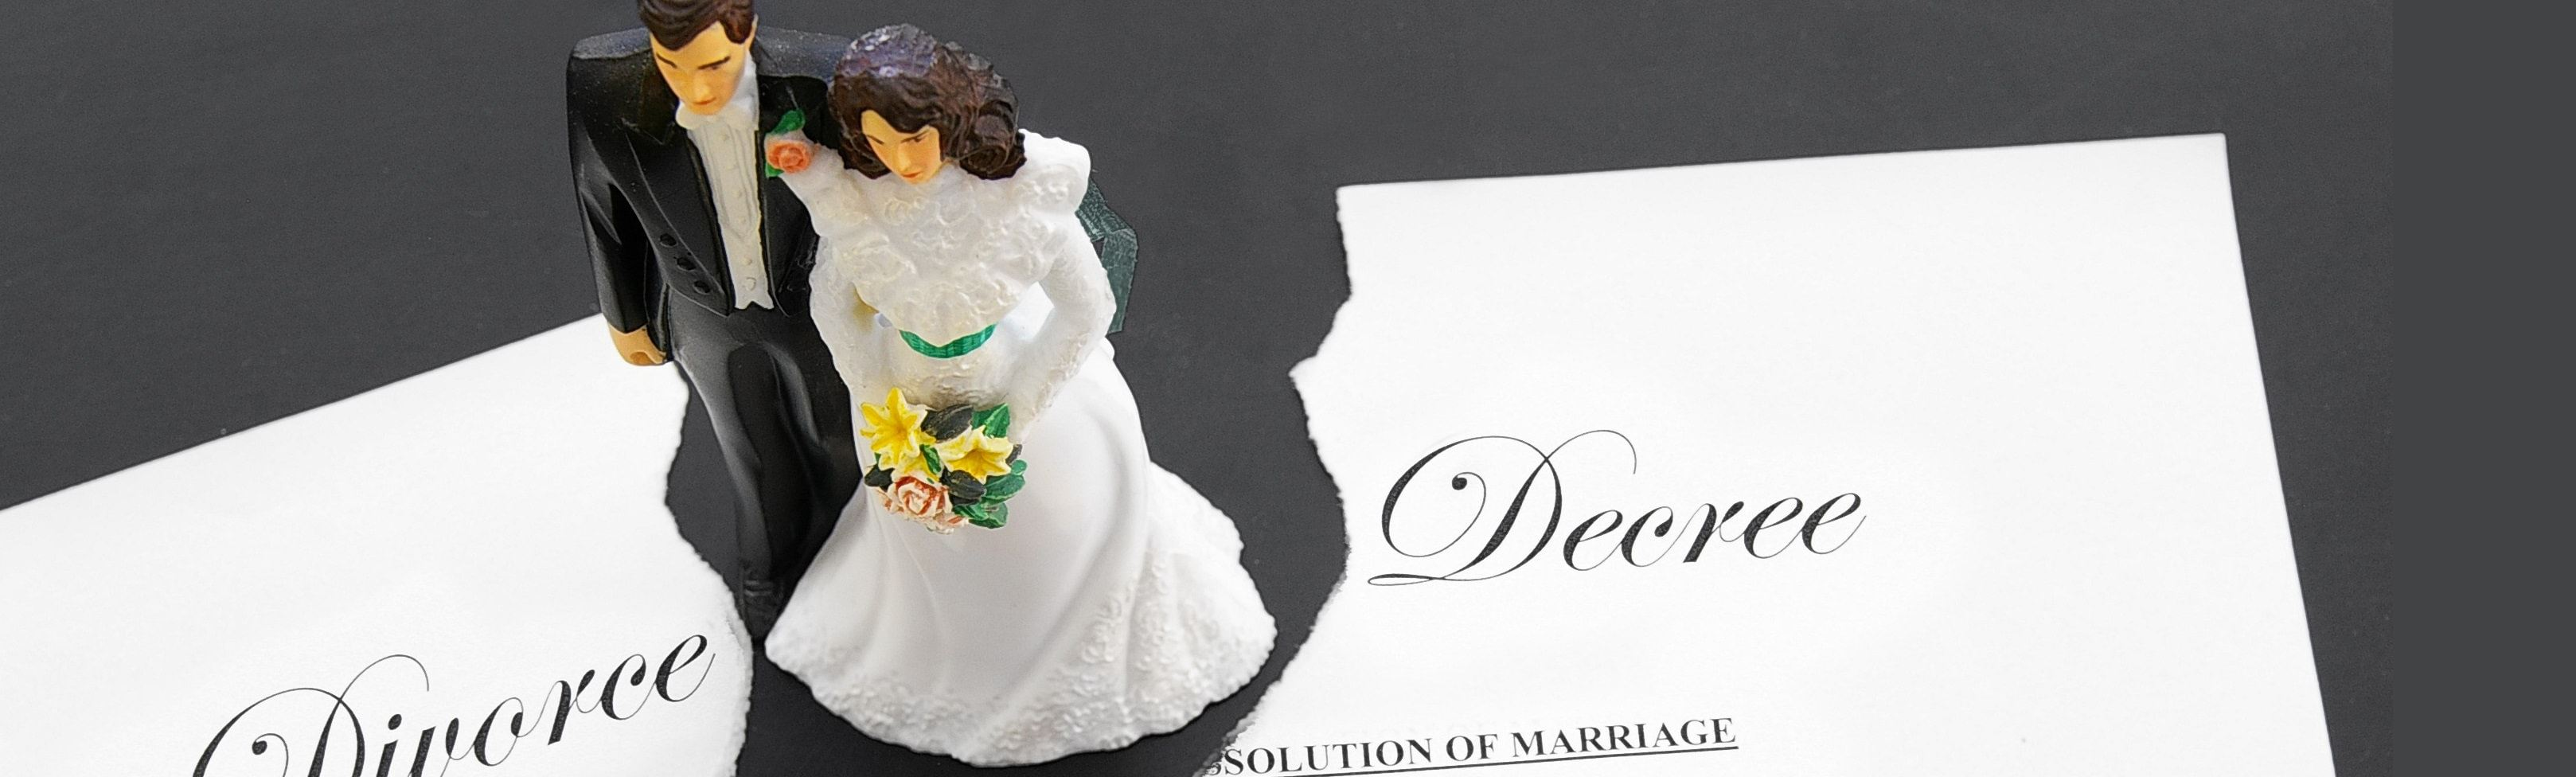 echtpaar echtscheiding